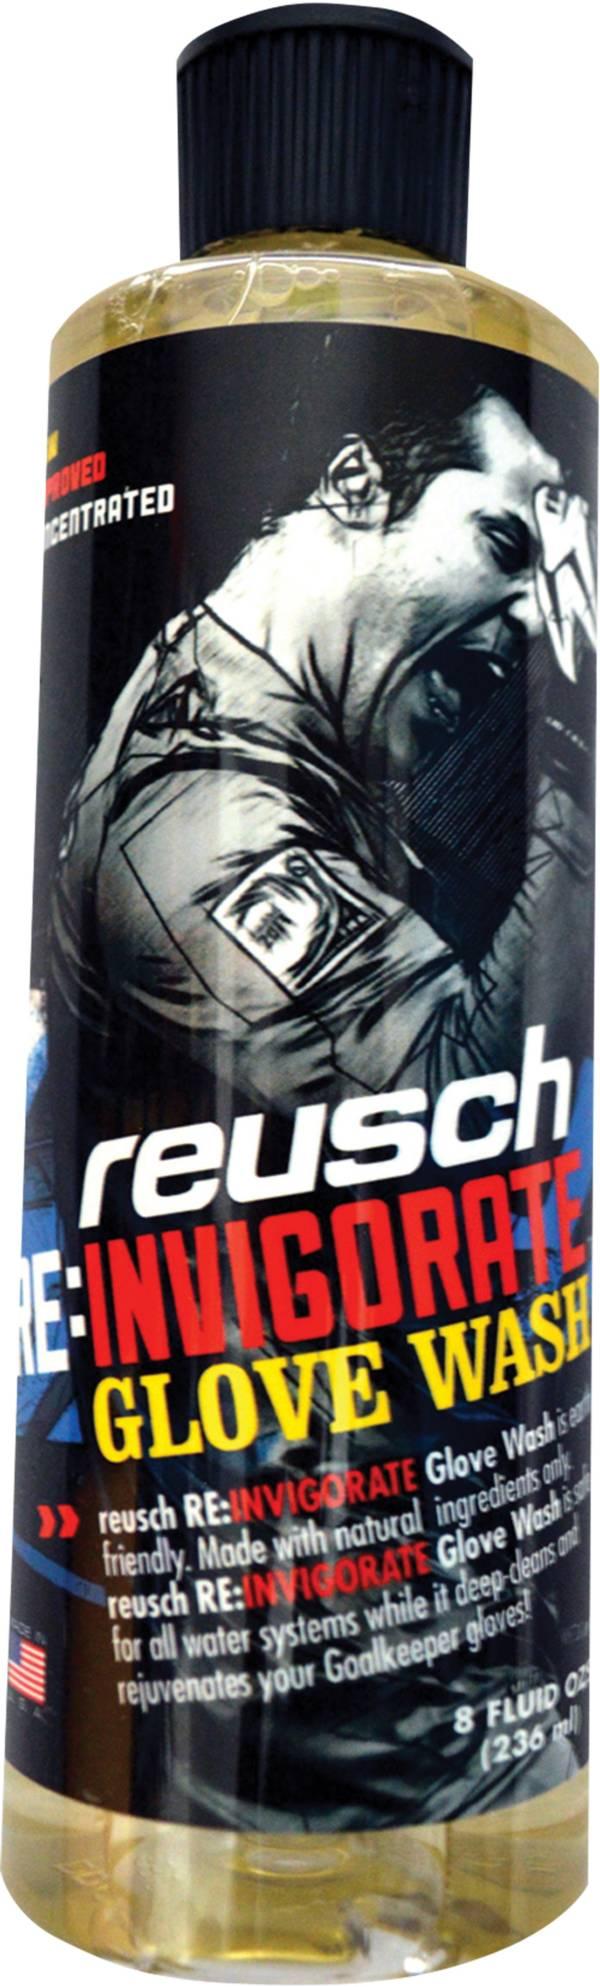 Reusch Re:Invigorate Goalkeeper Glove Wash product image